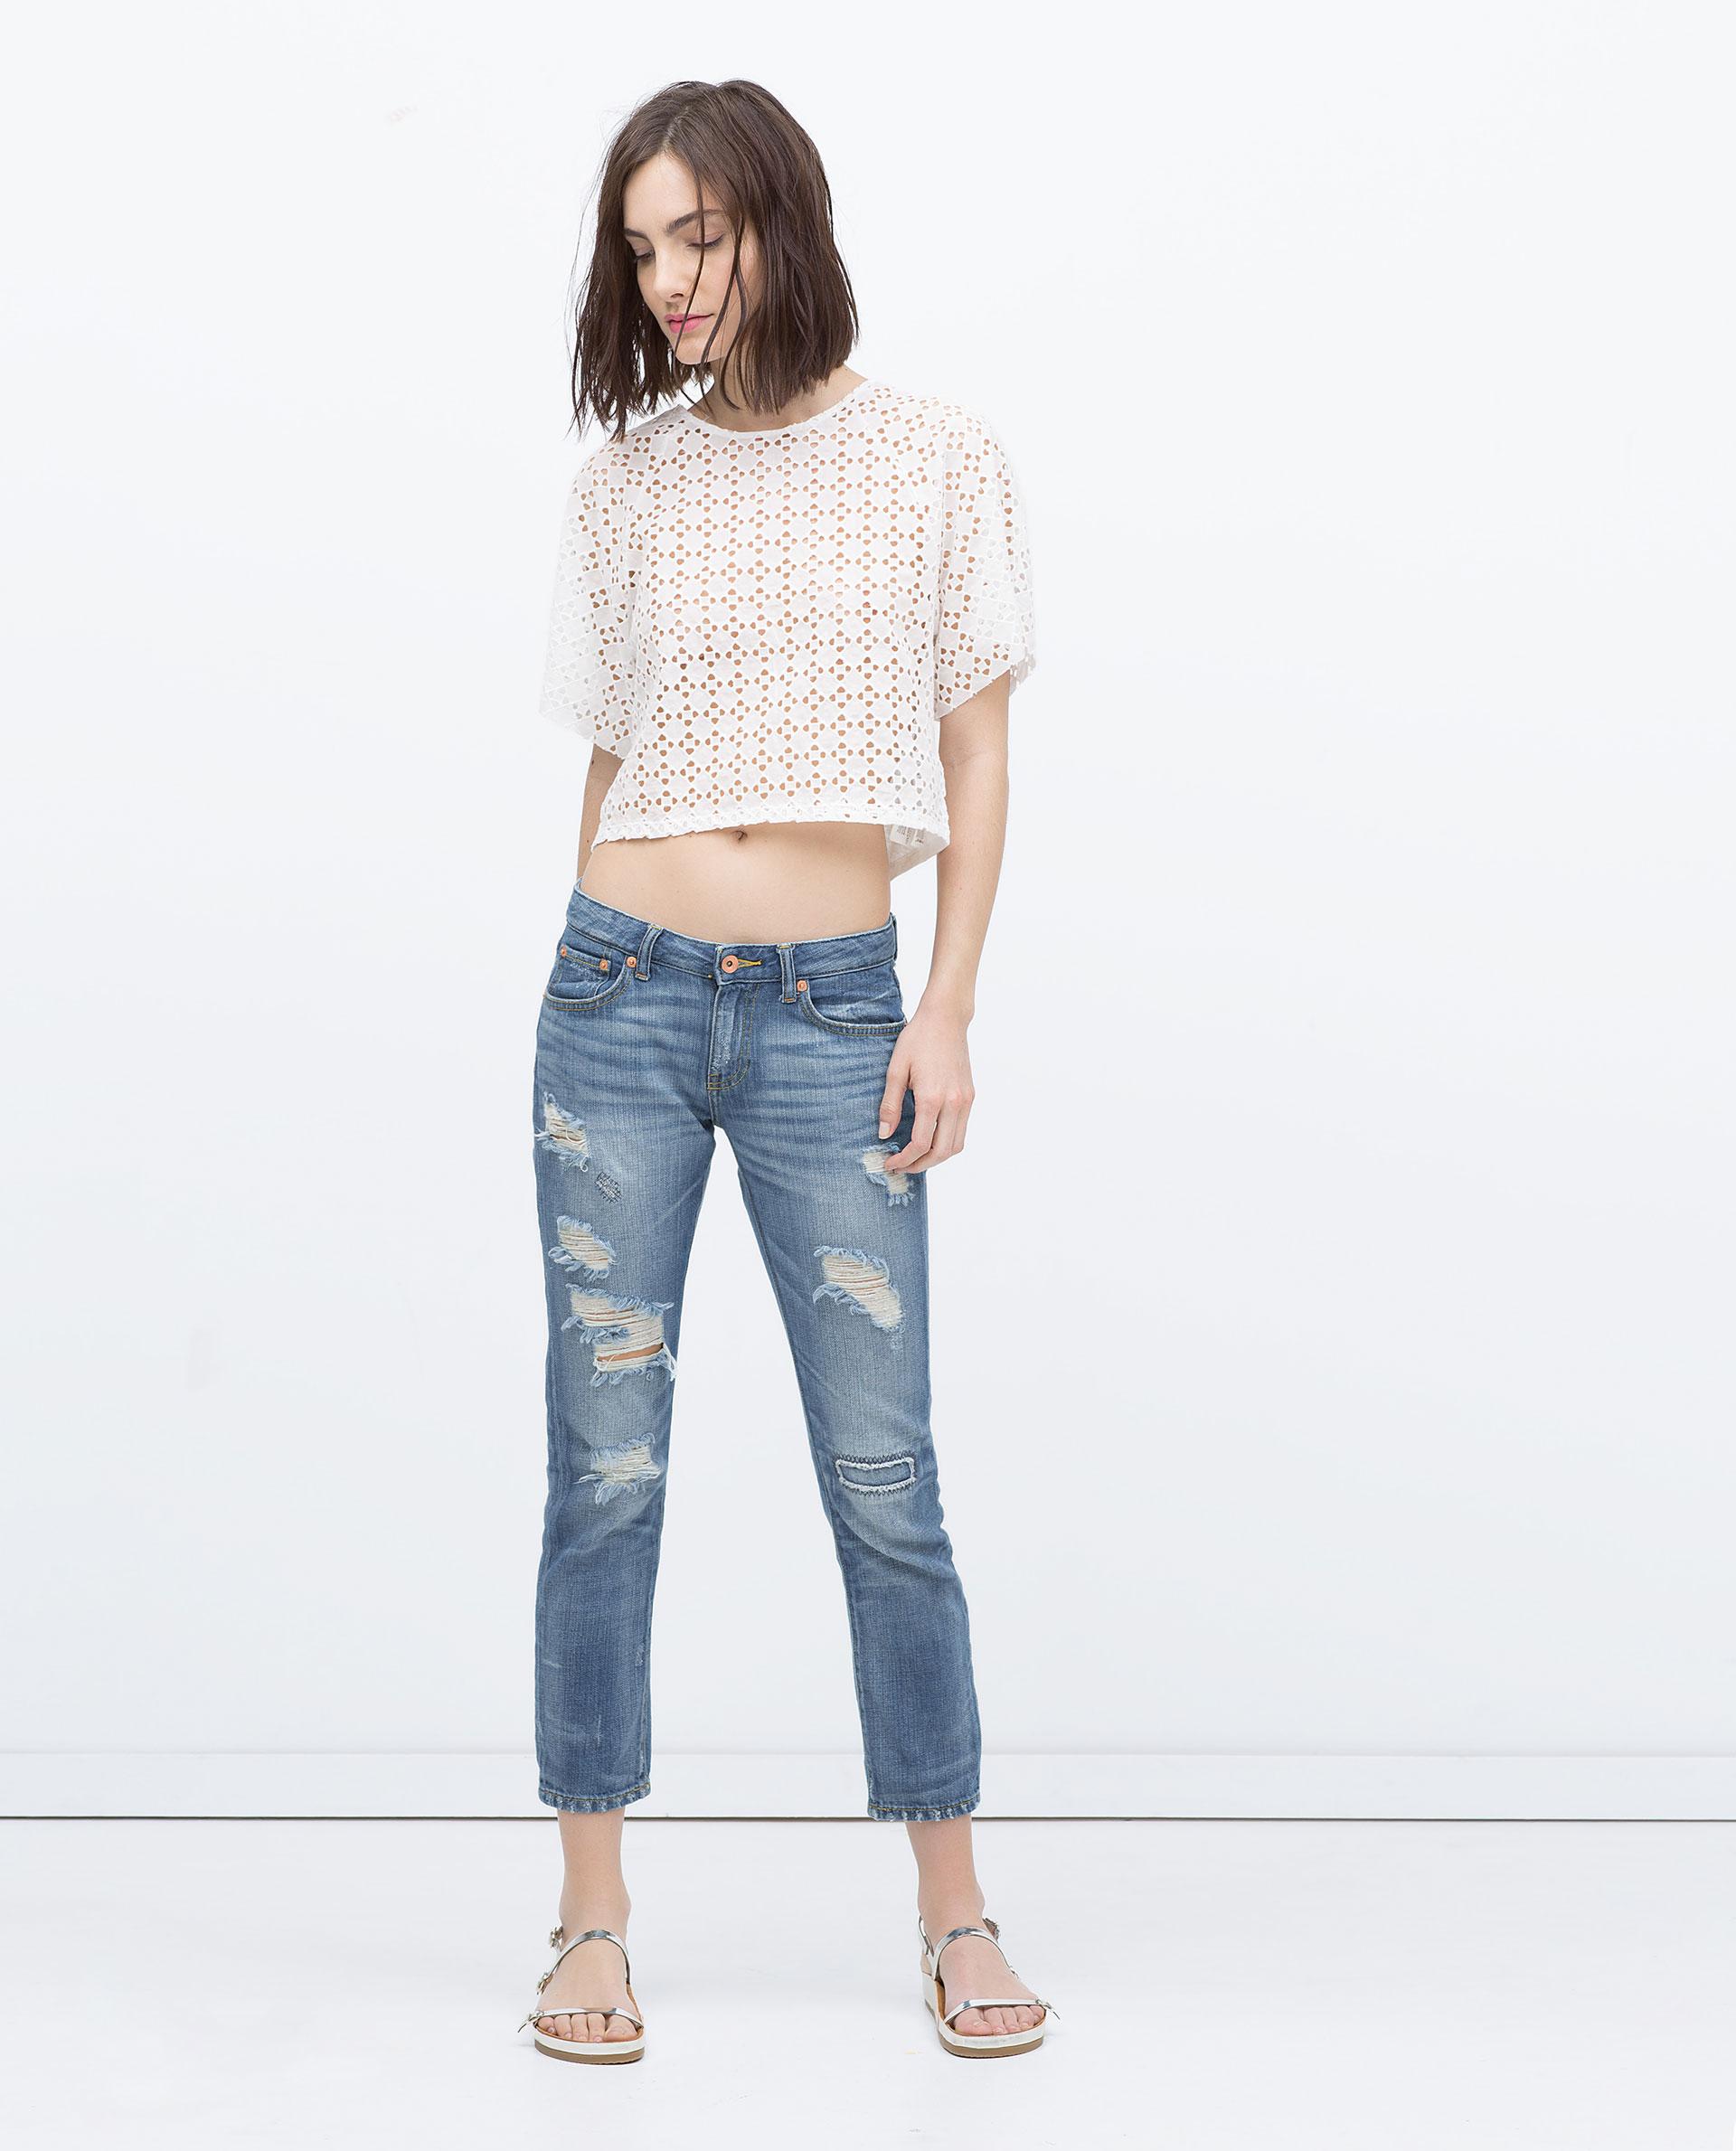 JEANS - Boyfriend - Jeans - WOMAN | ZARA Canada